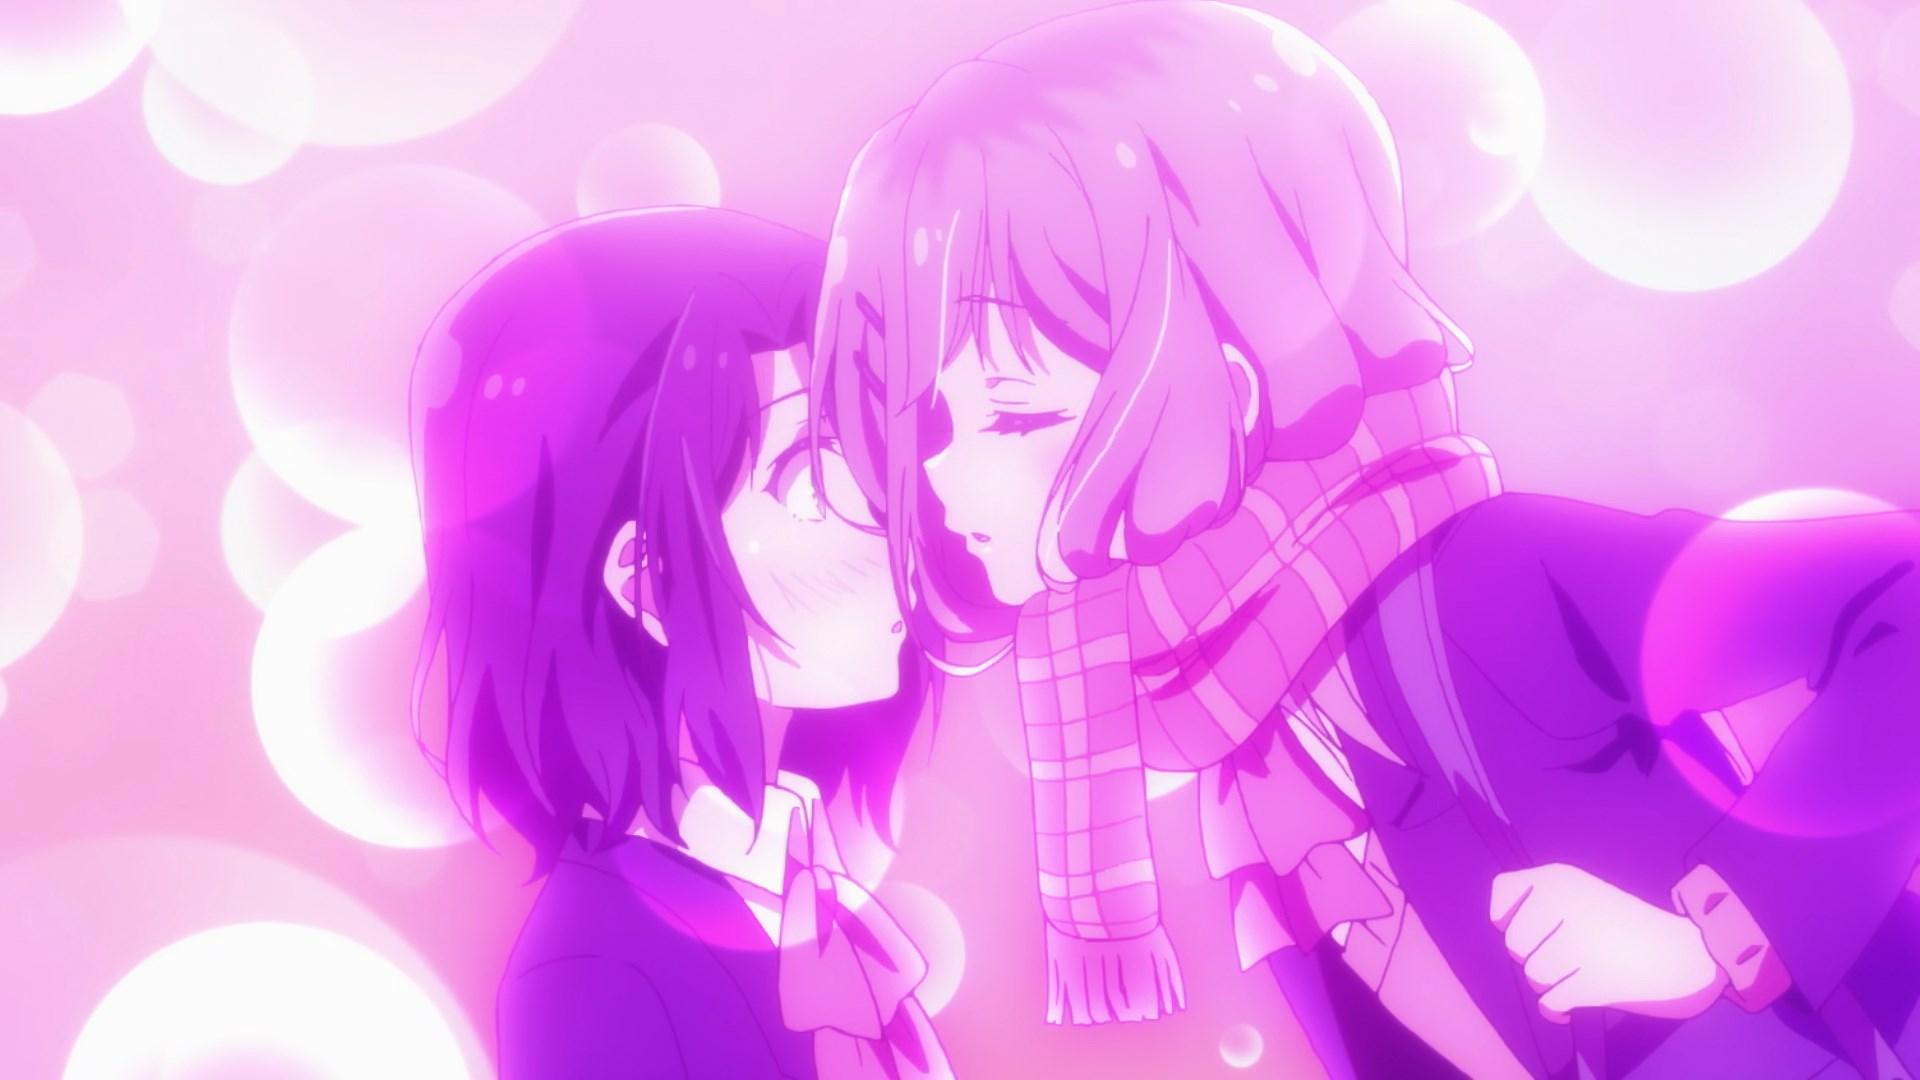 Shimamura whispers something to Adachi